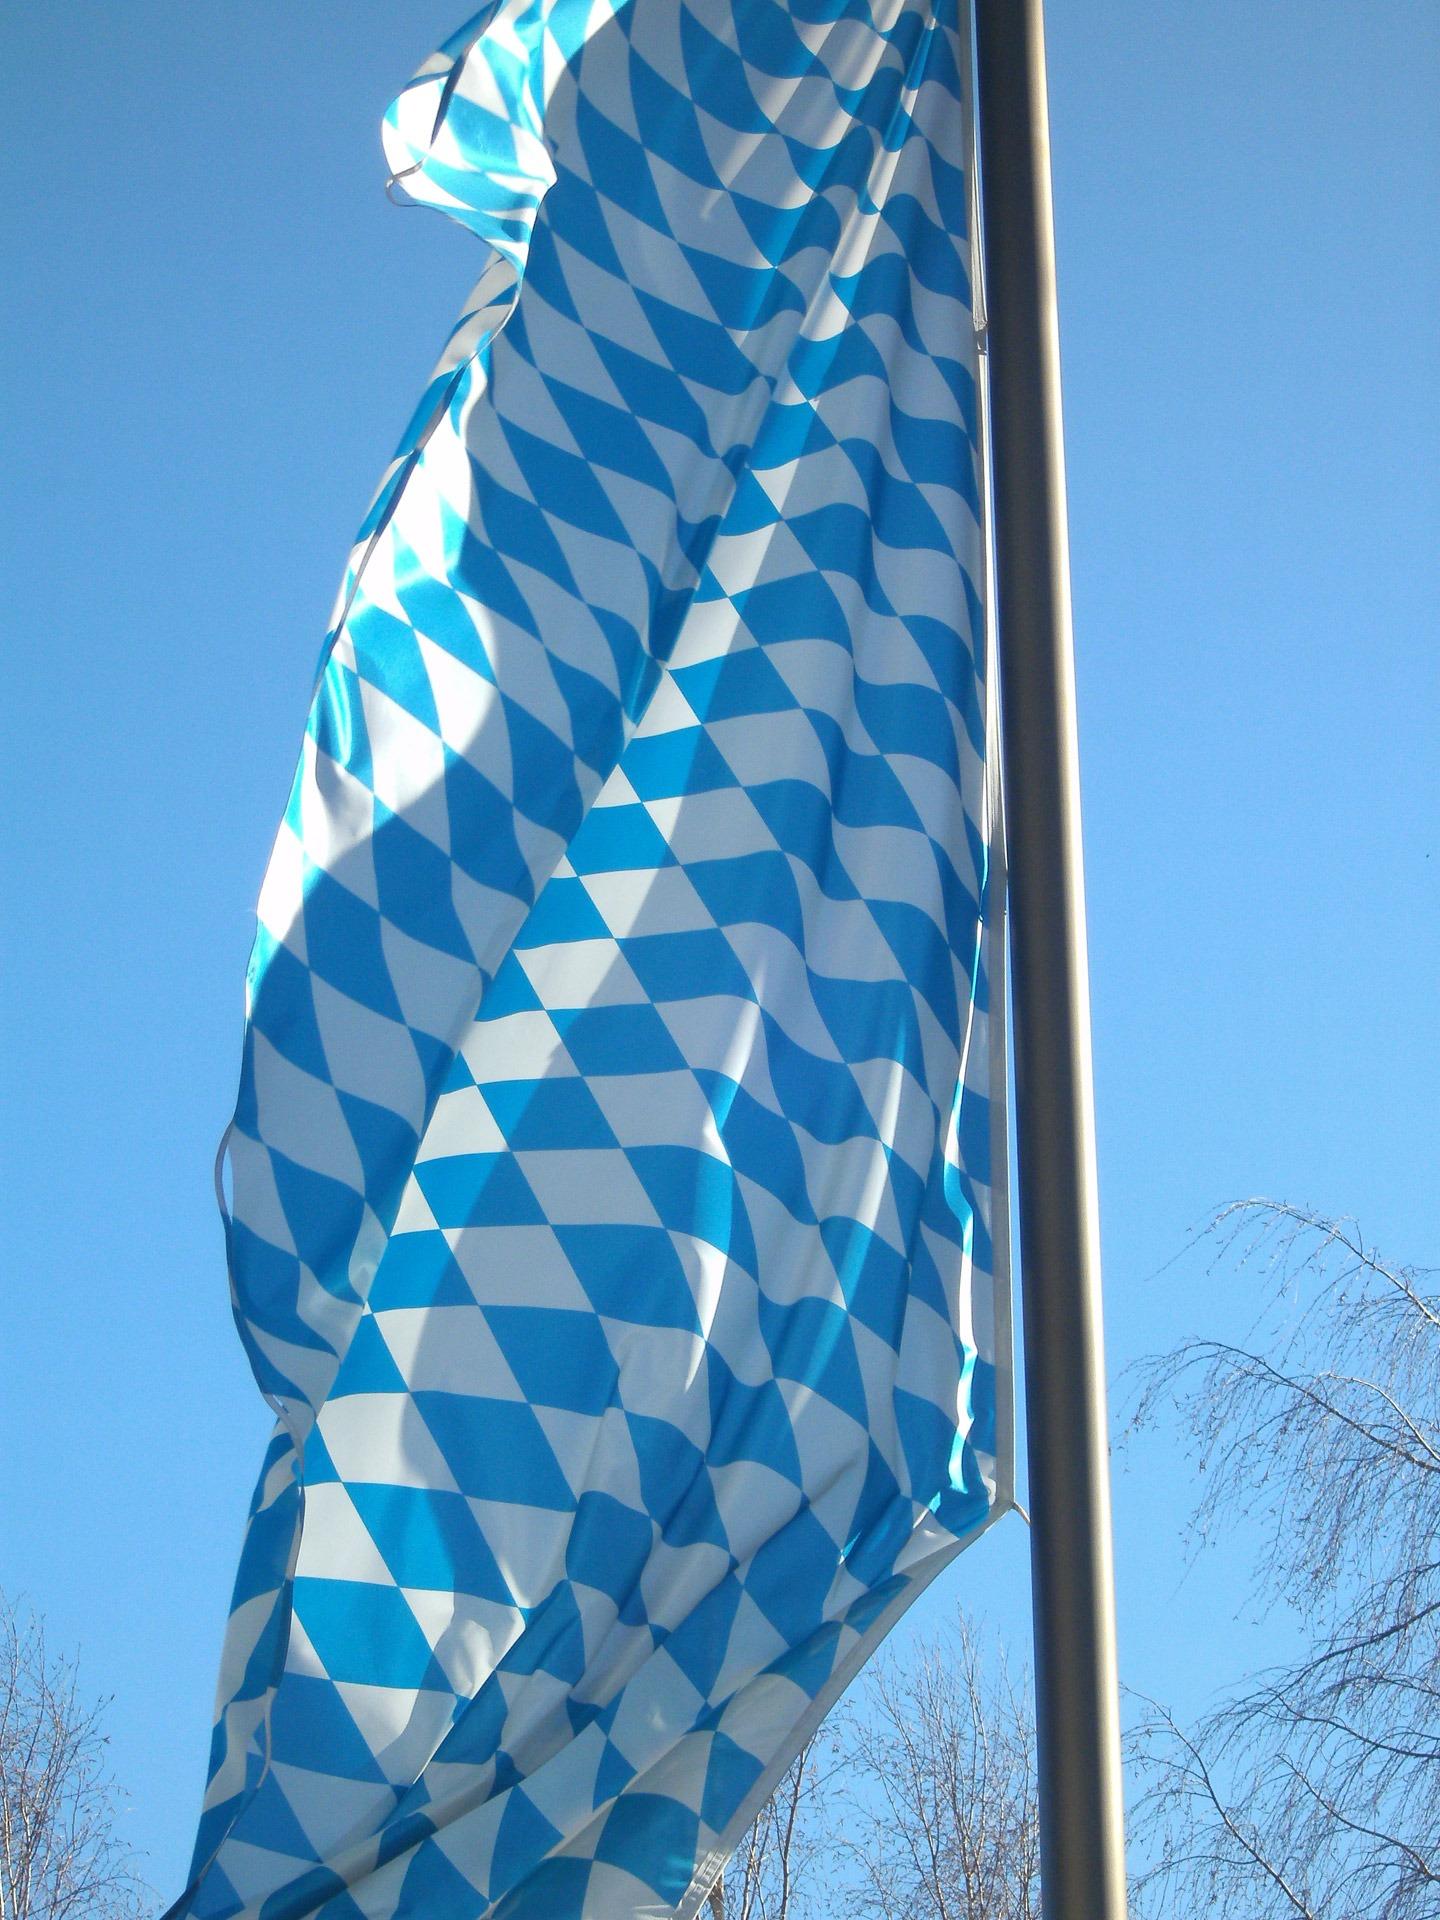 fahnen ung flaggen